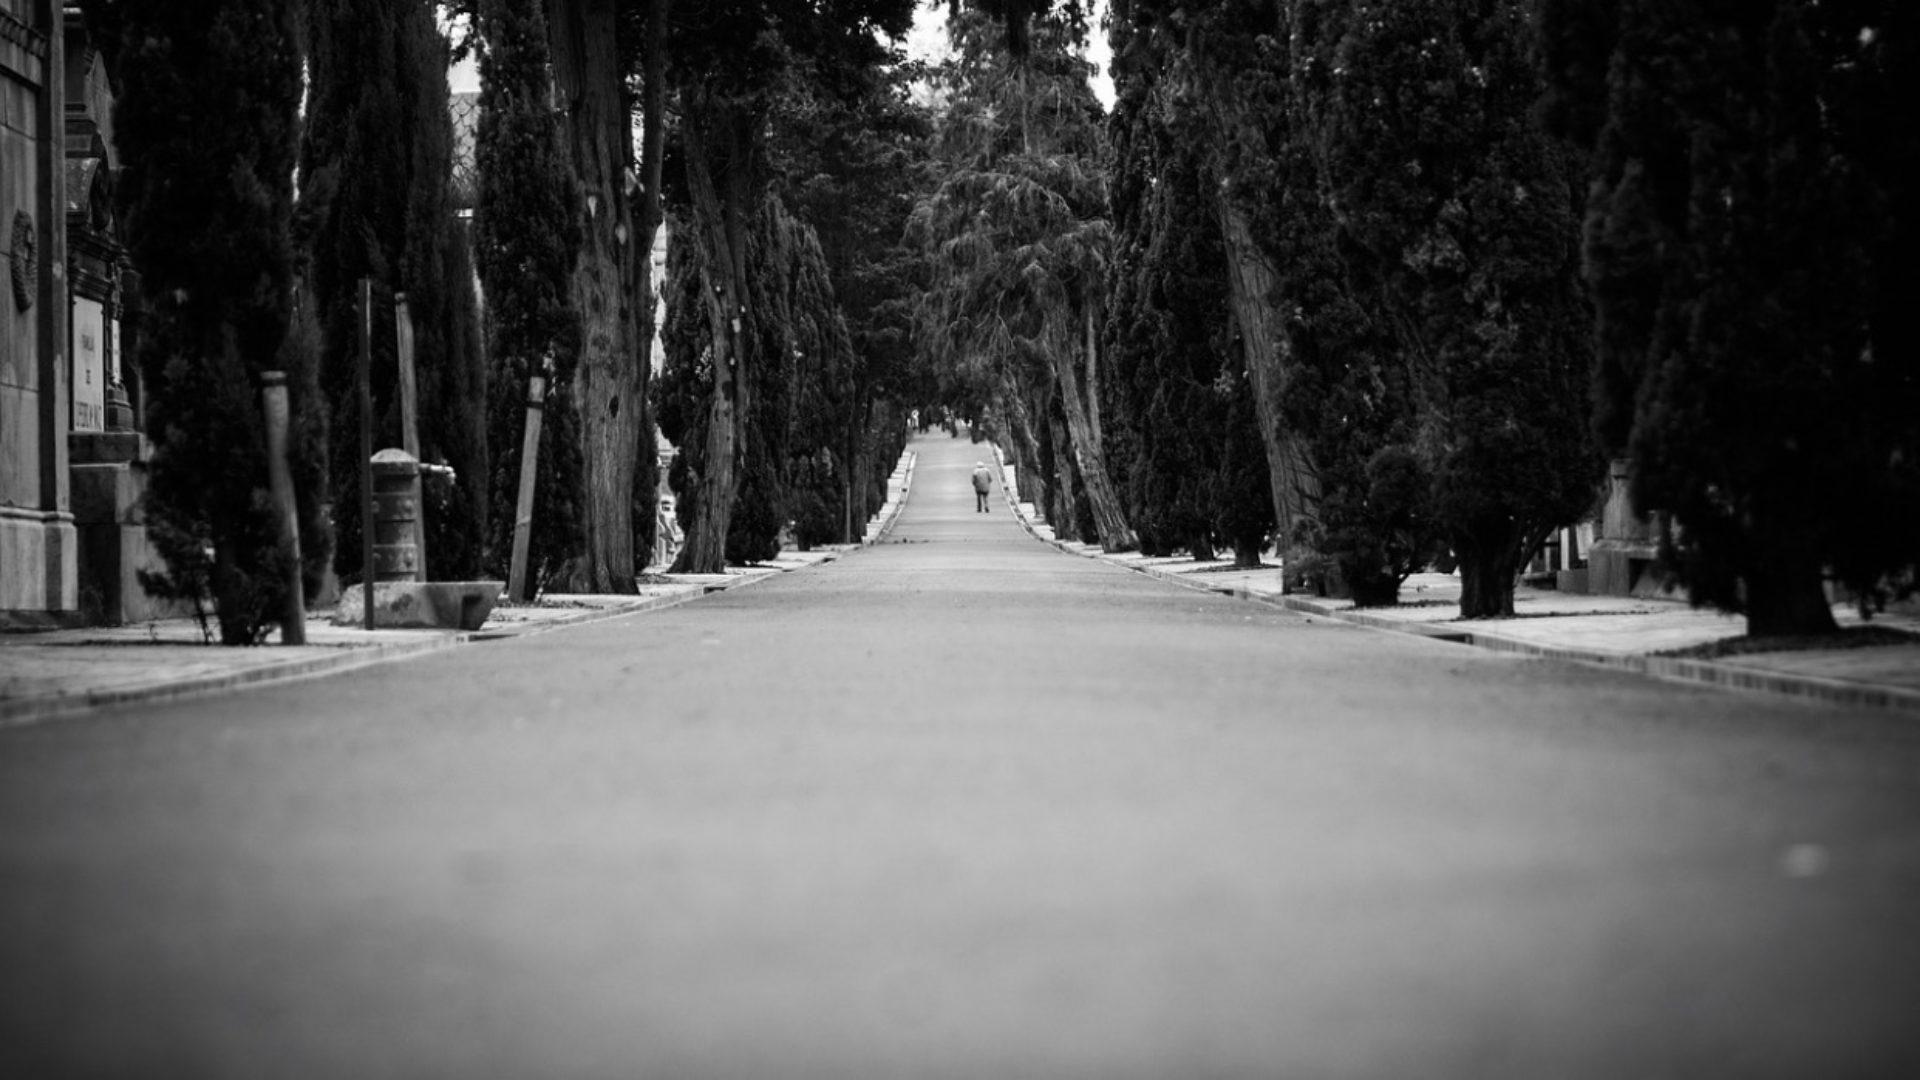 Mulherin Lane